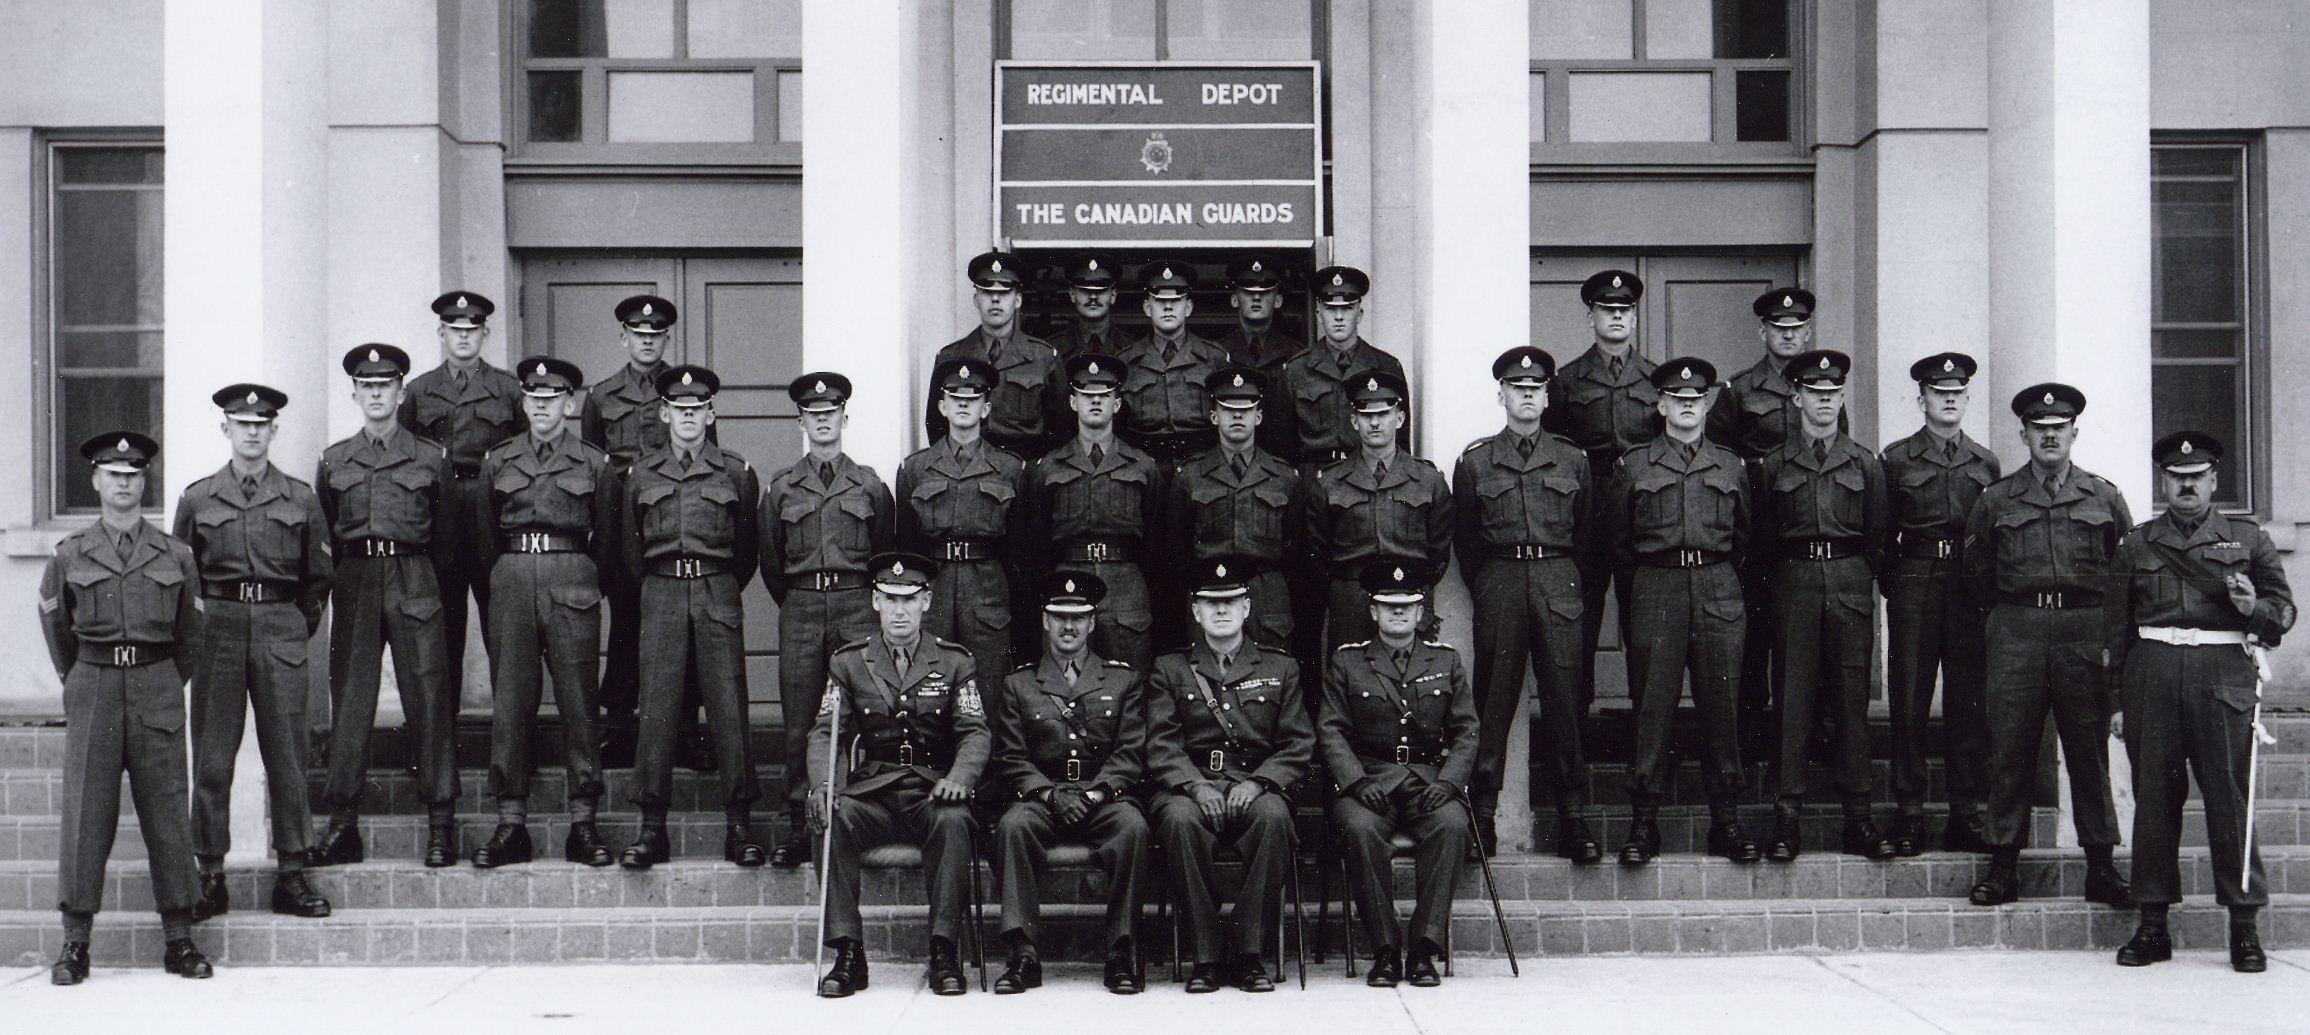 12_Cdn Guards Depot circa 1958